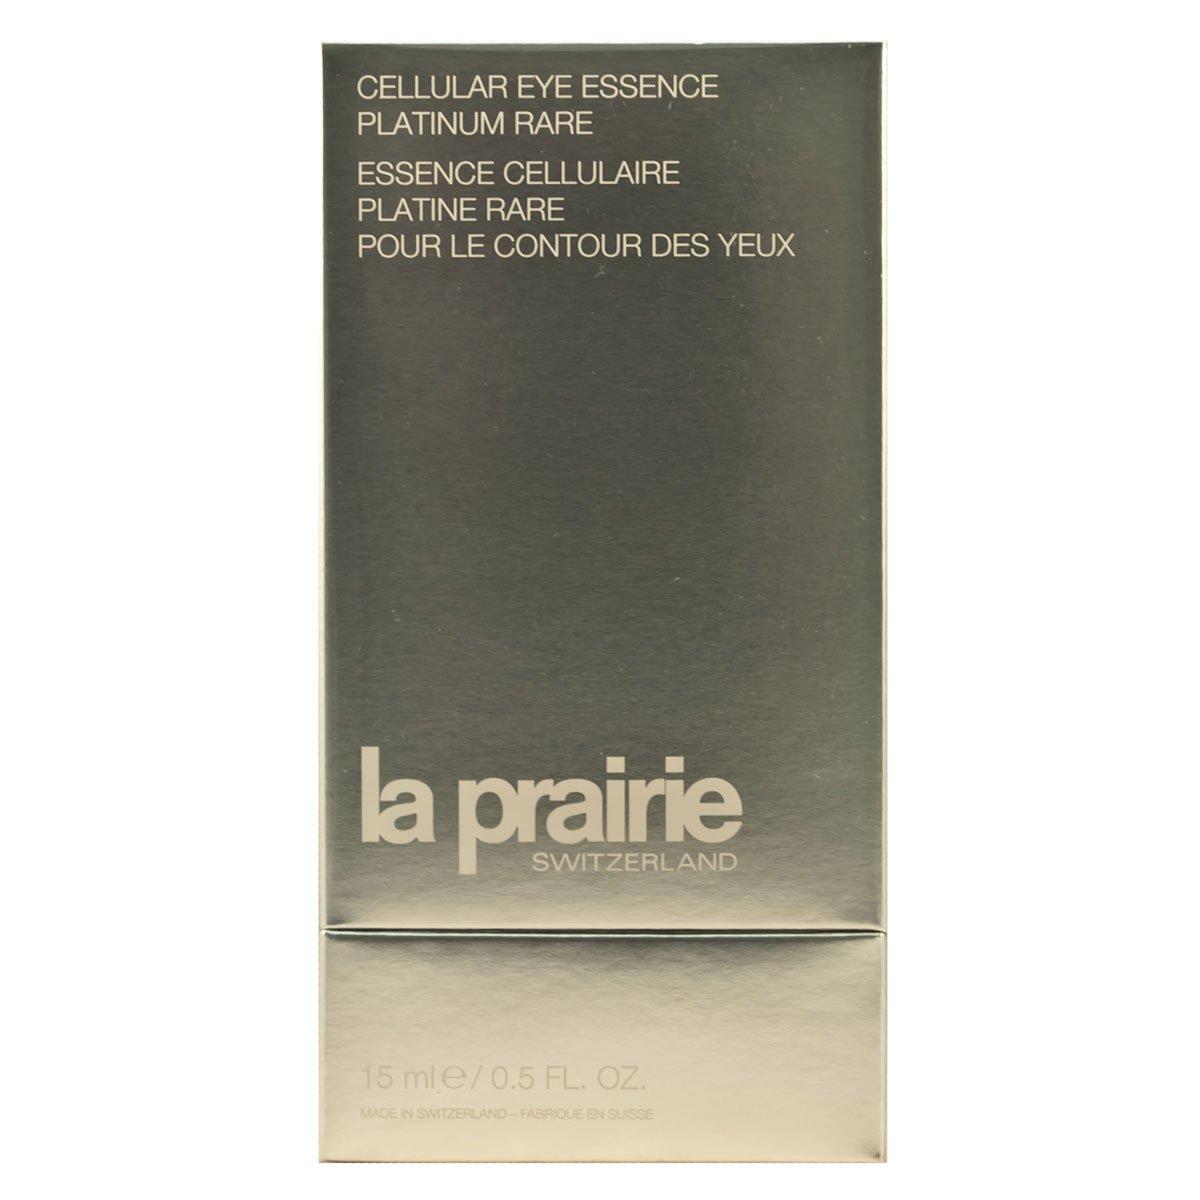 La Prairie Cellular Eye Essence Platinum Rare Serum, 0.5 Ounce